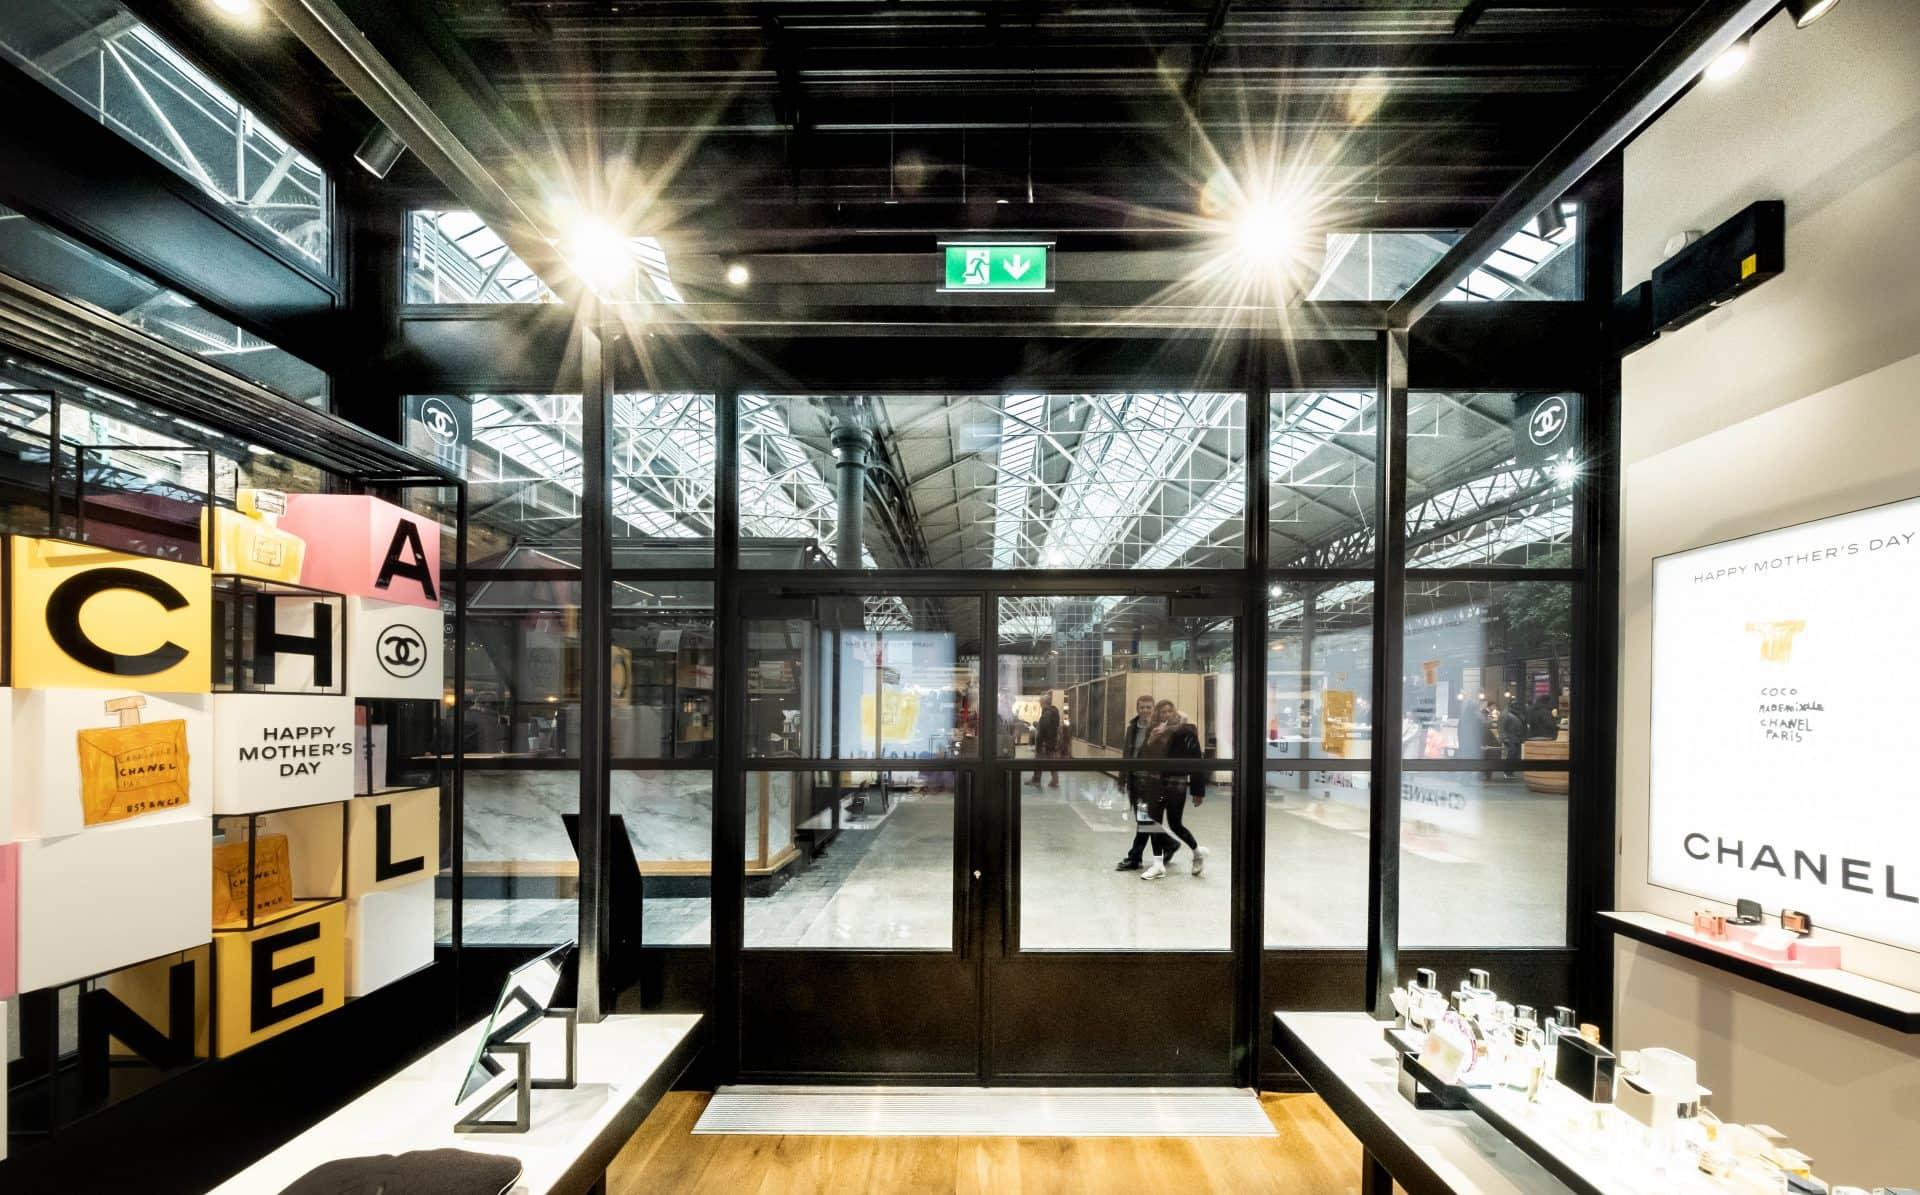 Chanel shop with steel industrial look doors and windows